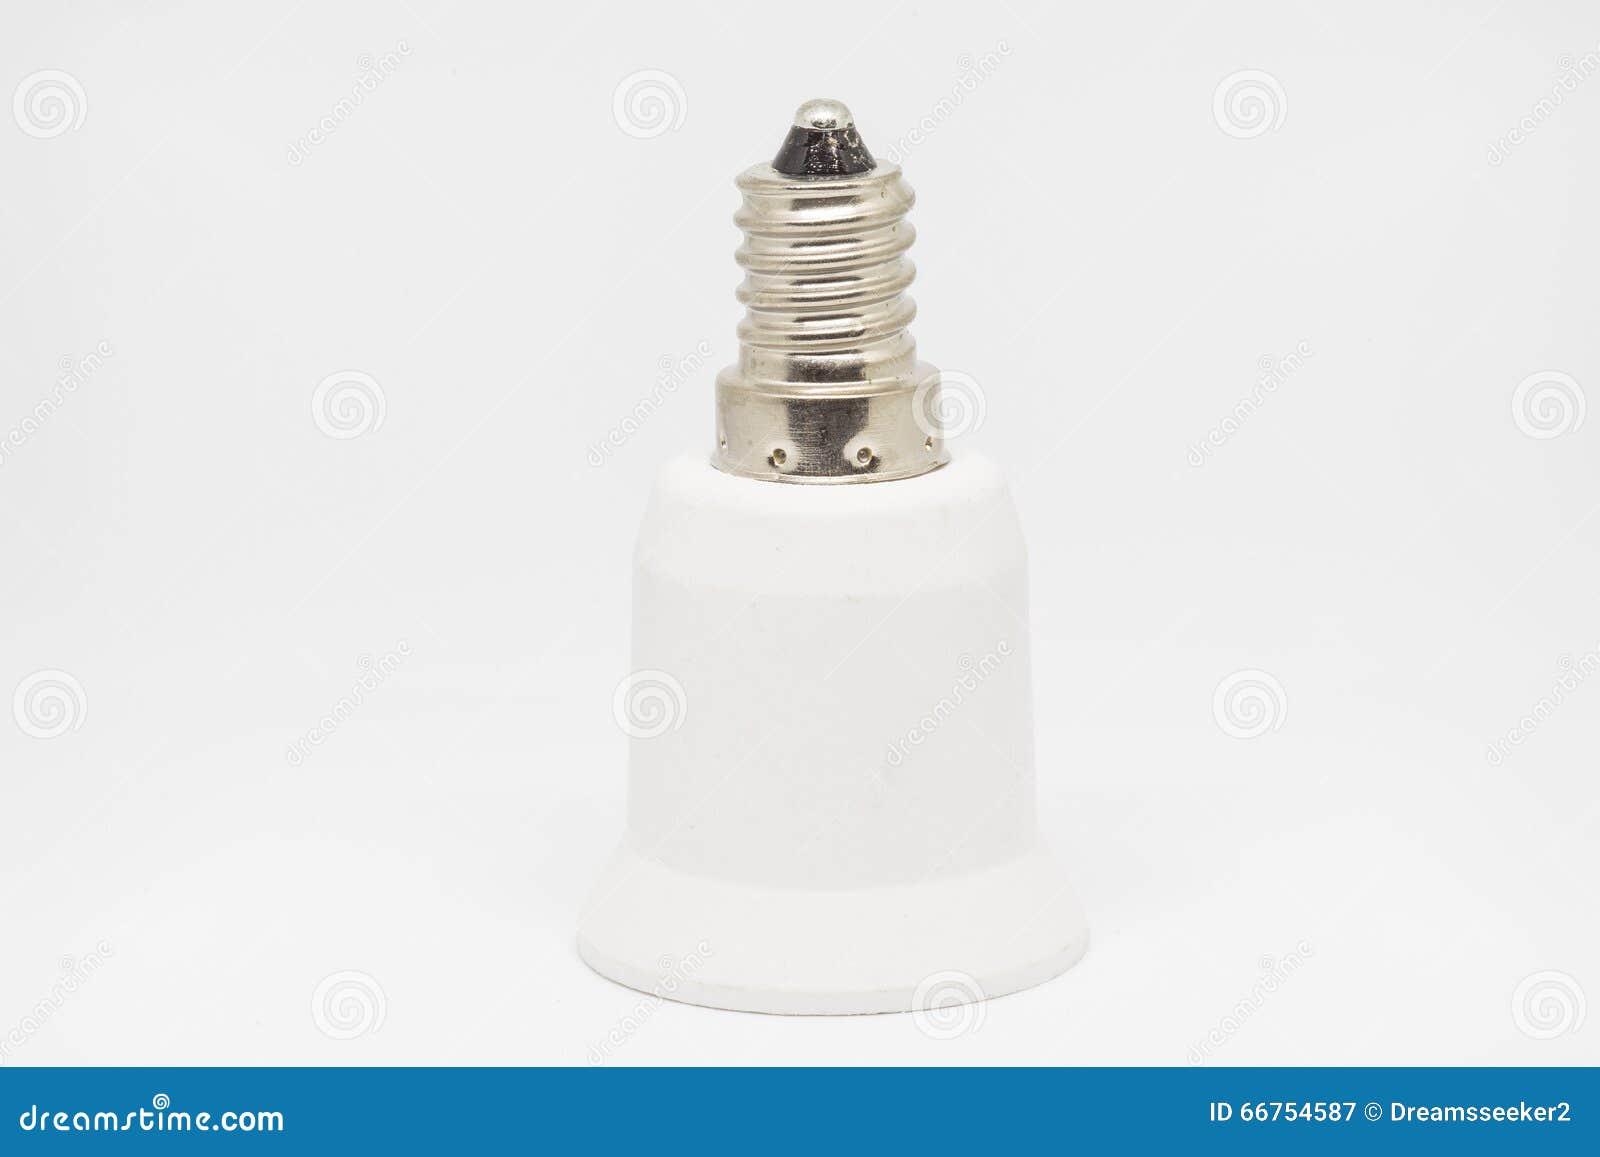 Lampholder Adapter E14 To E27 Stock Image - Image of fixture